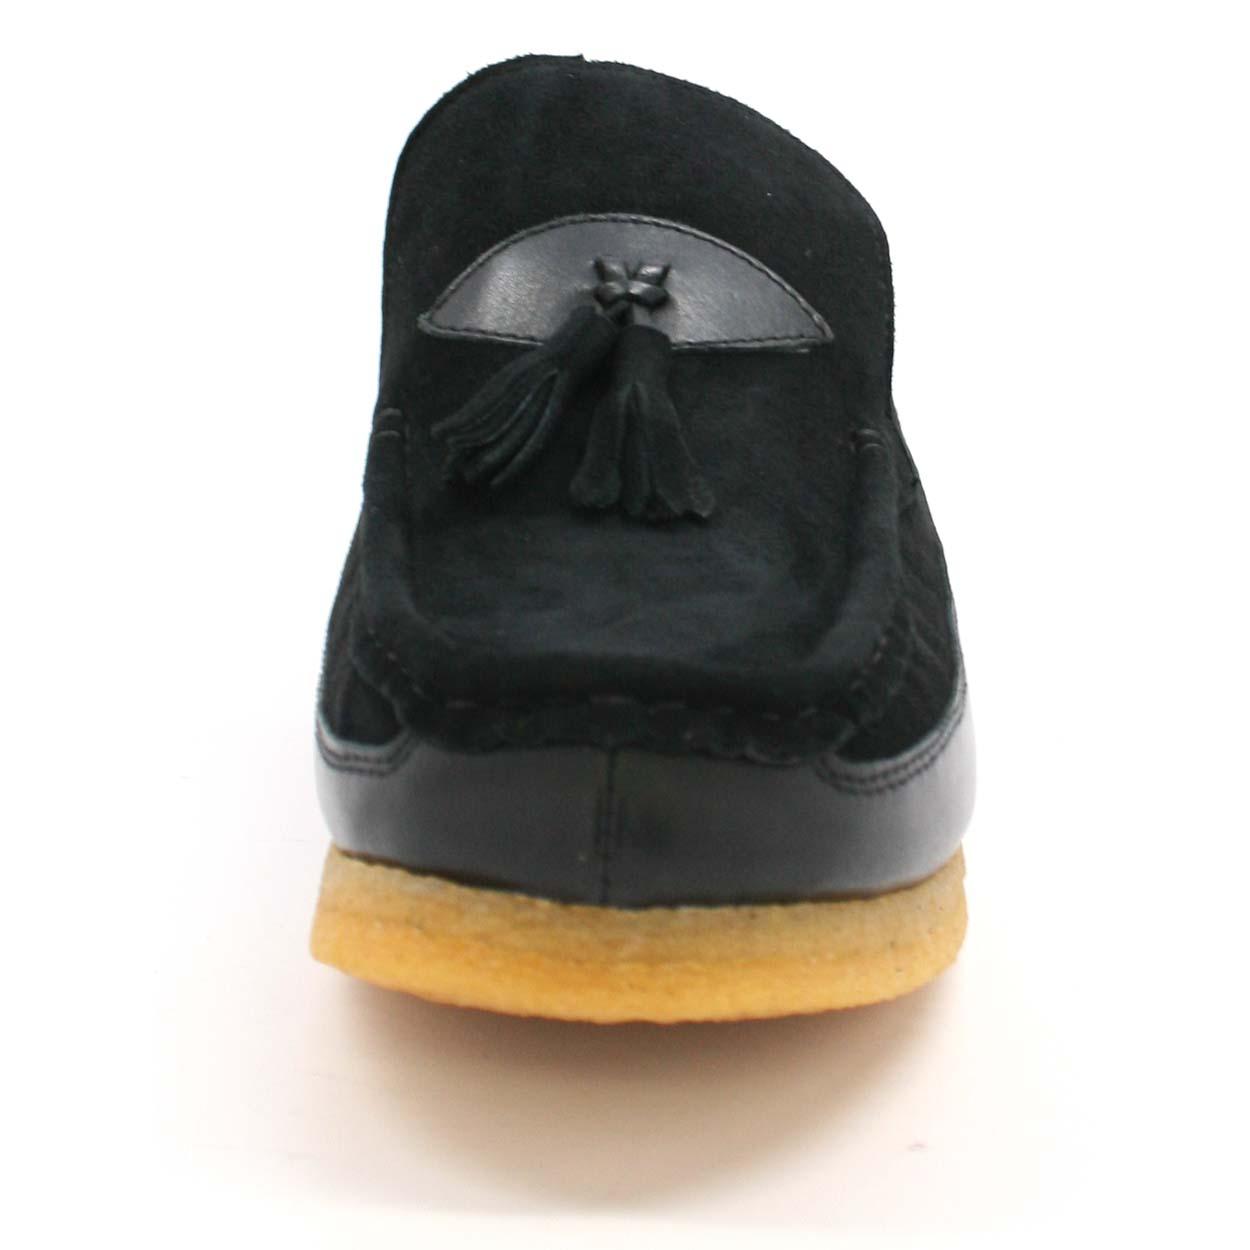 British Collection King Old School Slip On Black Suede